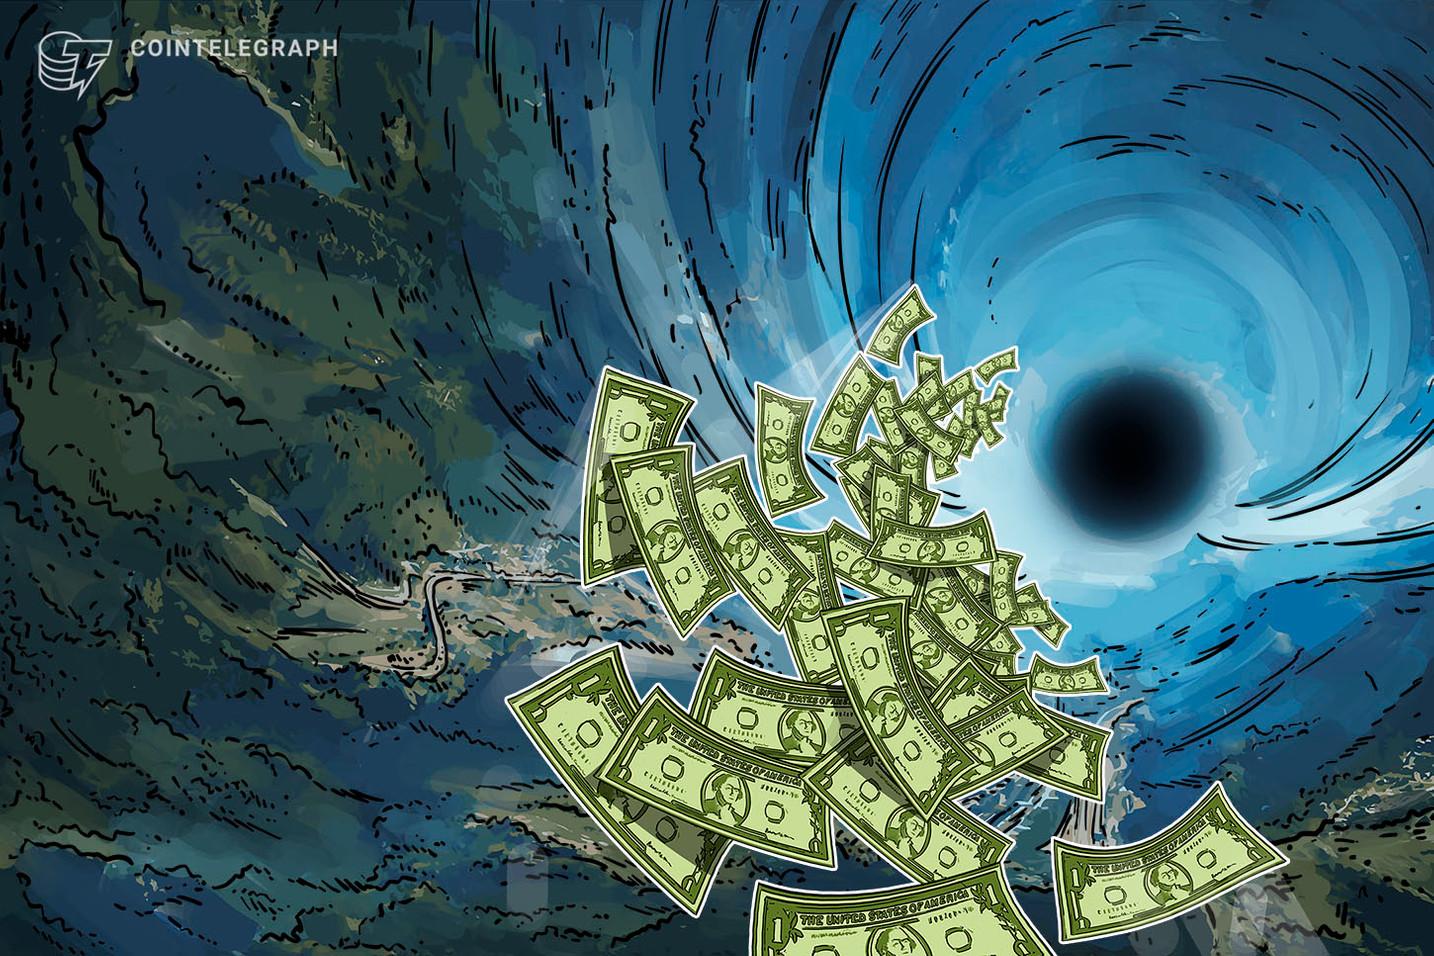 Margin Lenders on Poloniex Lost $13.5 Million Due to Flash Crash